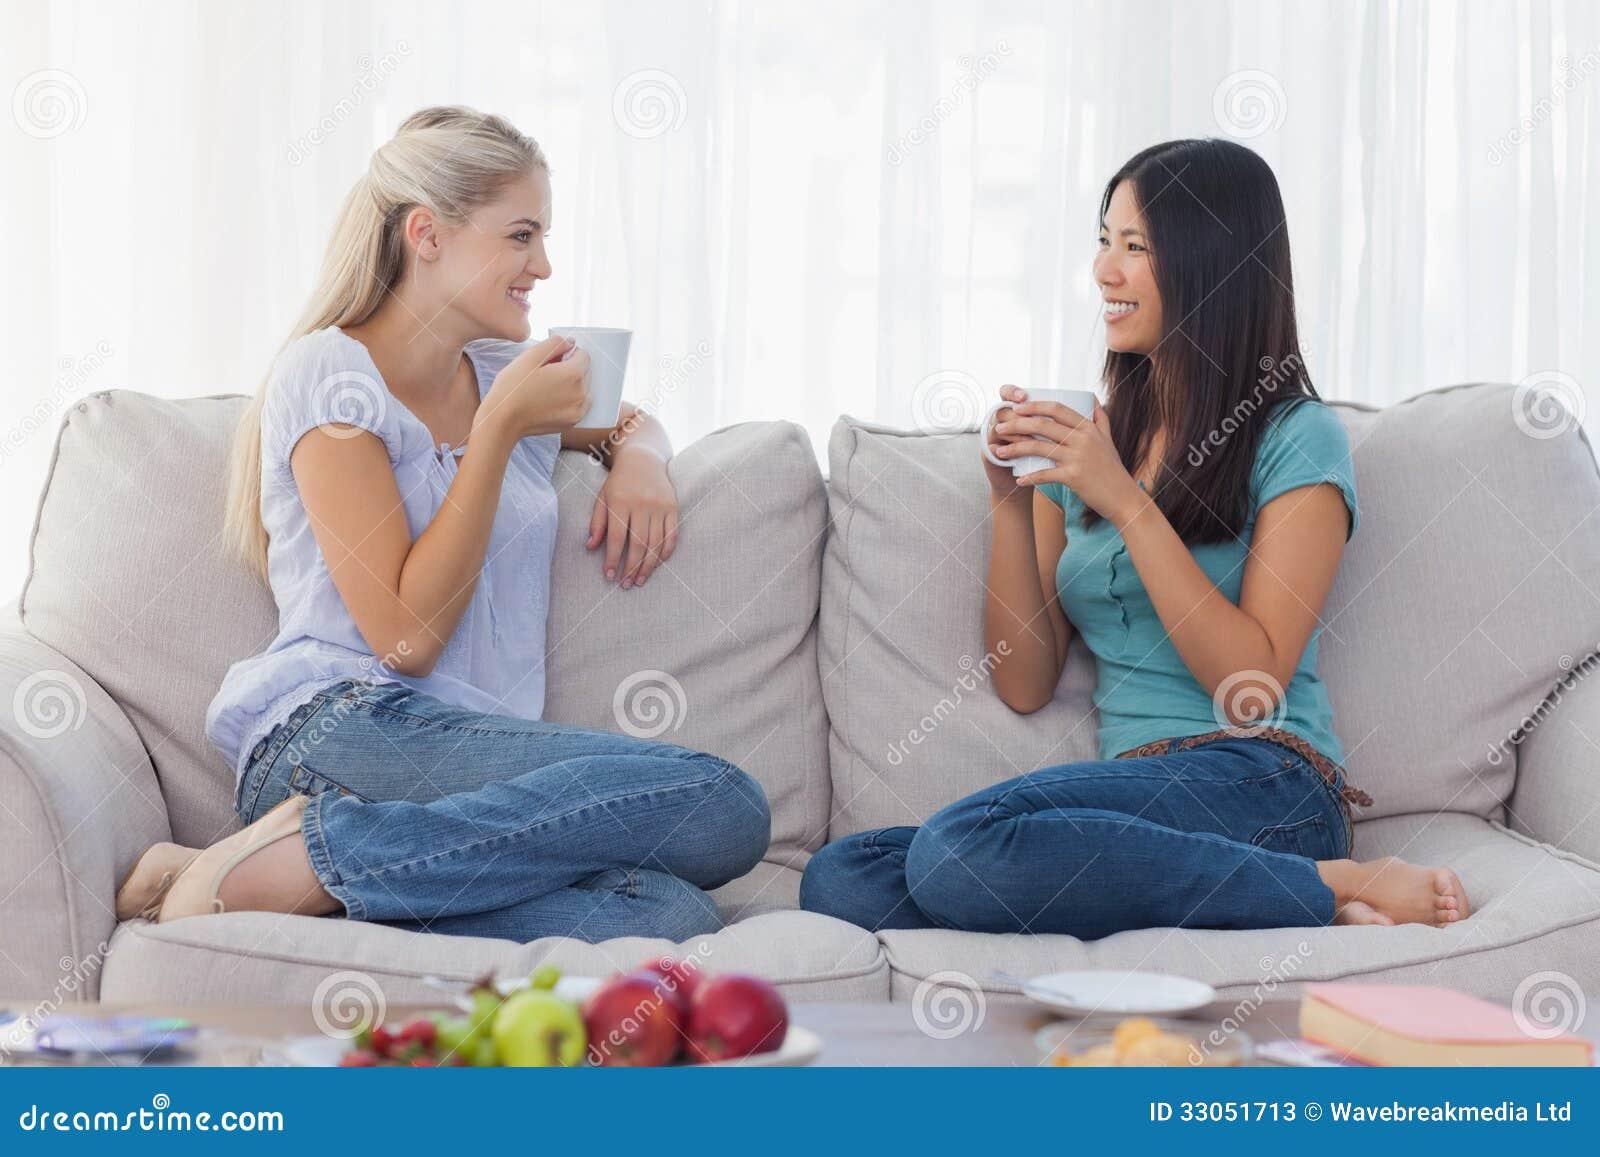 Chat friendship